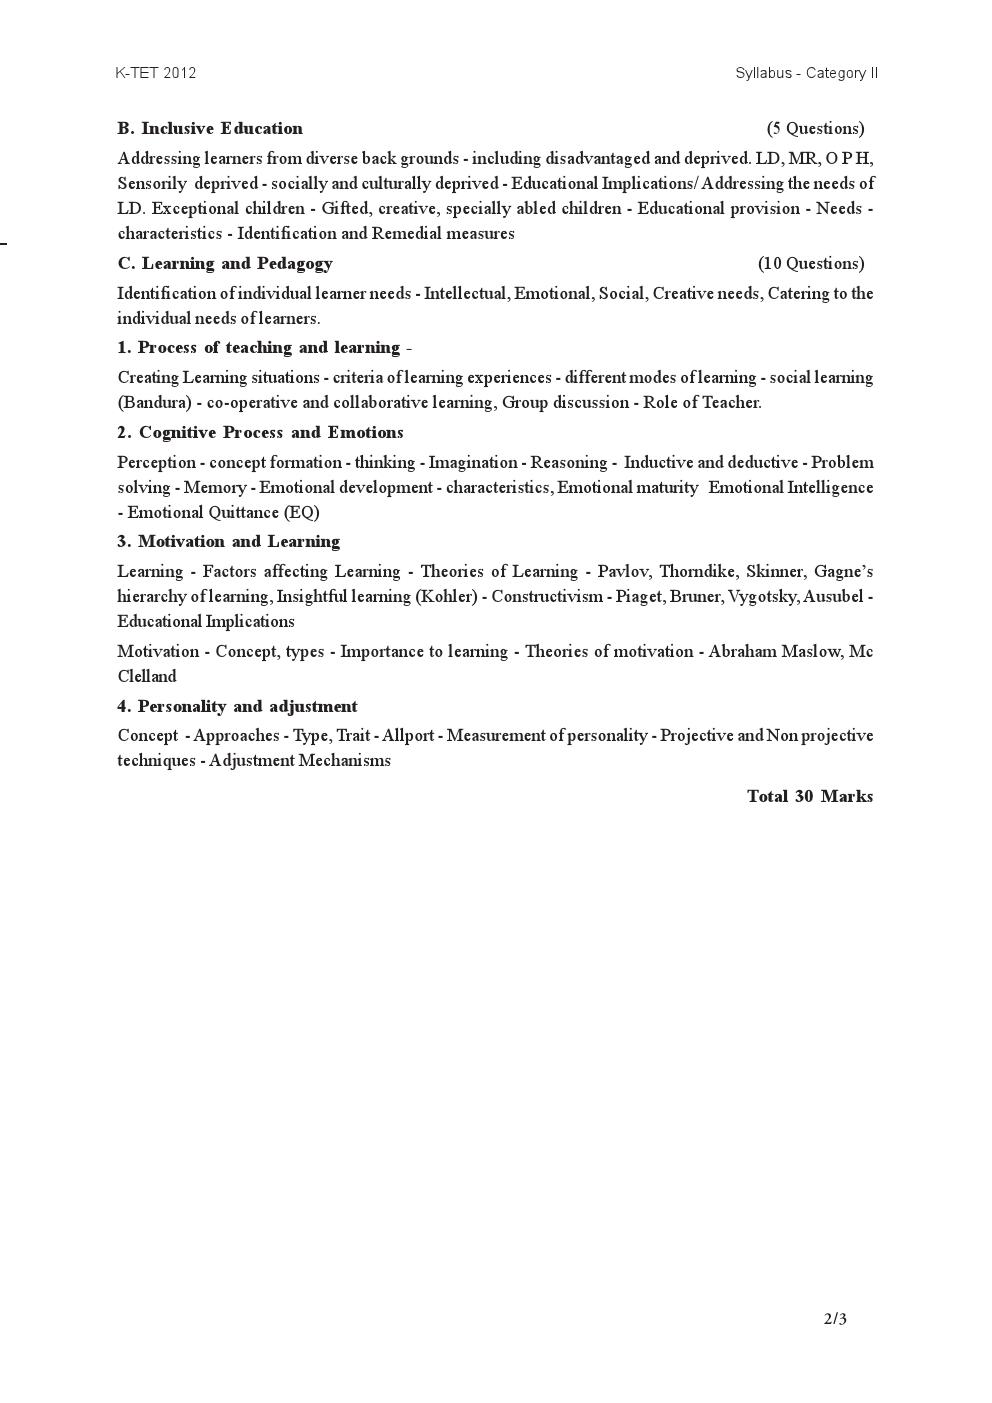 http://masterstudy.net/pdf/syllabus20003.jpg